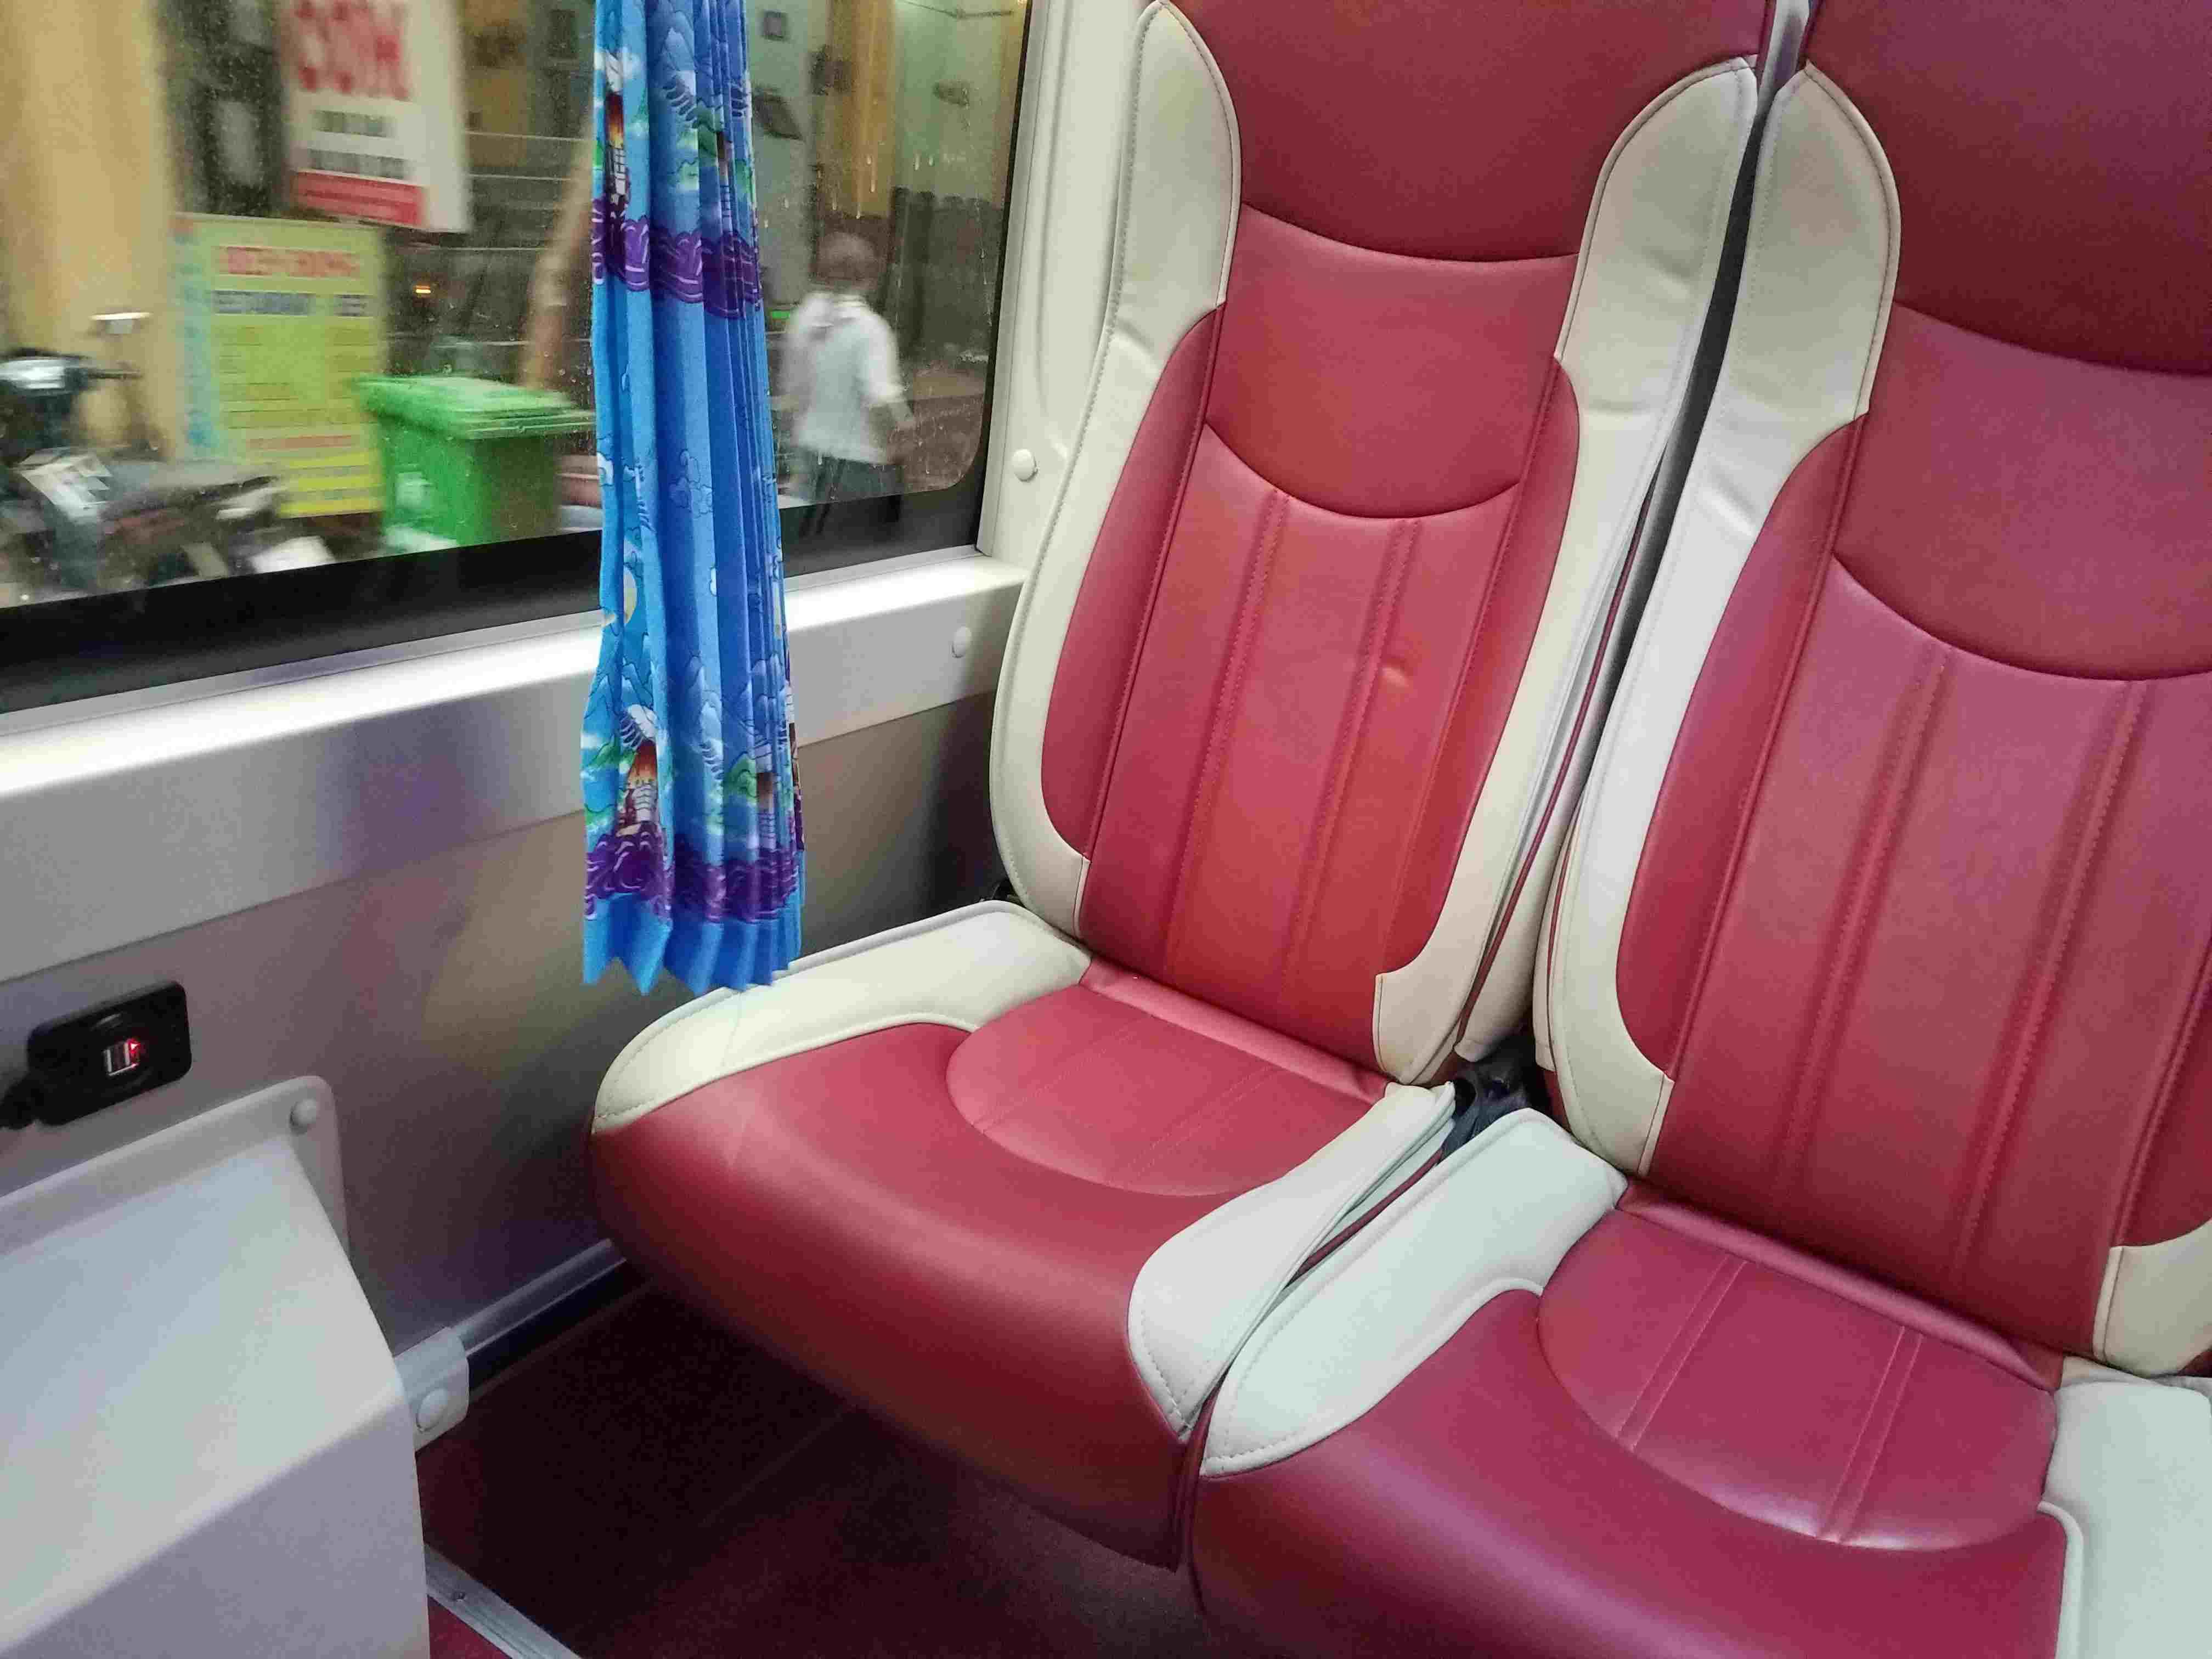 Confortable seat